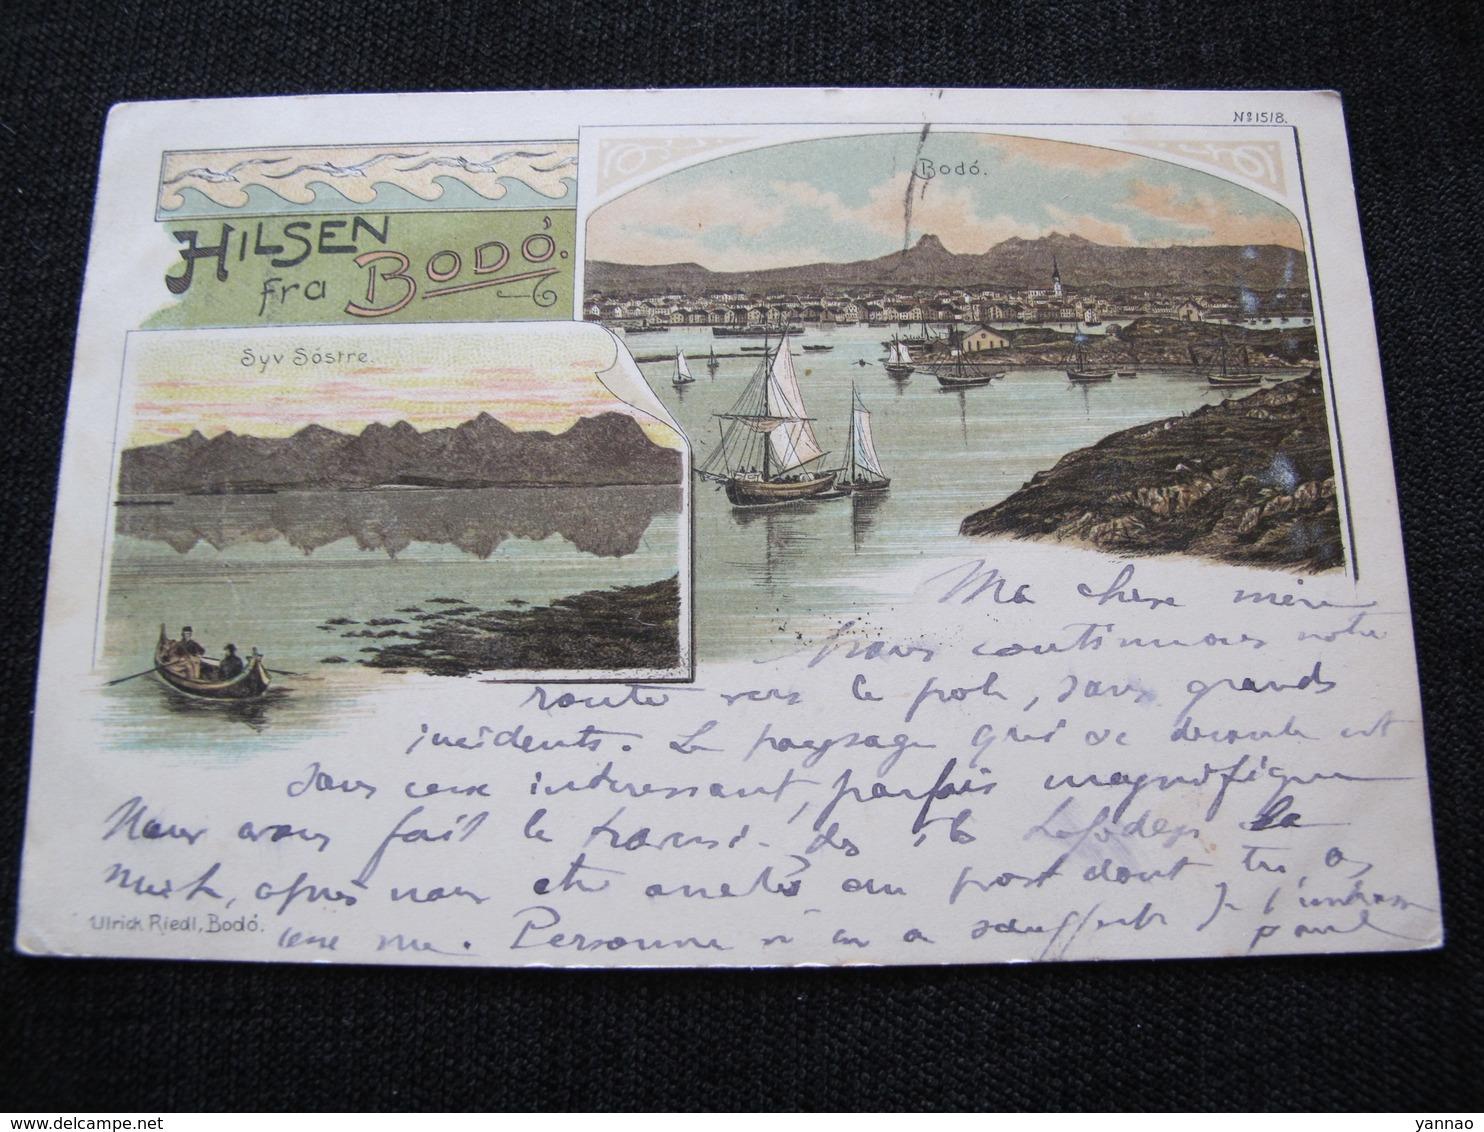 Ancienne Carte Postale Cpa Rare Hilsen Fra Bodo Circulée Vers Carolles 1901 - Norvège